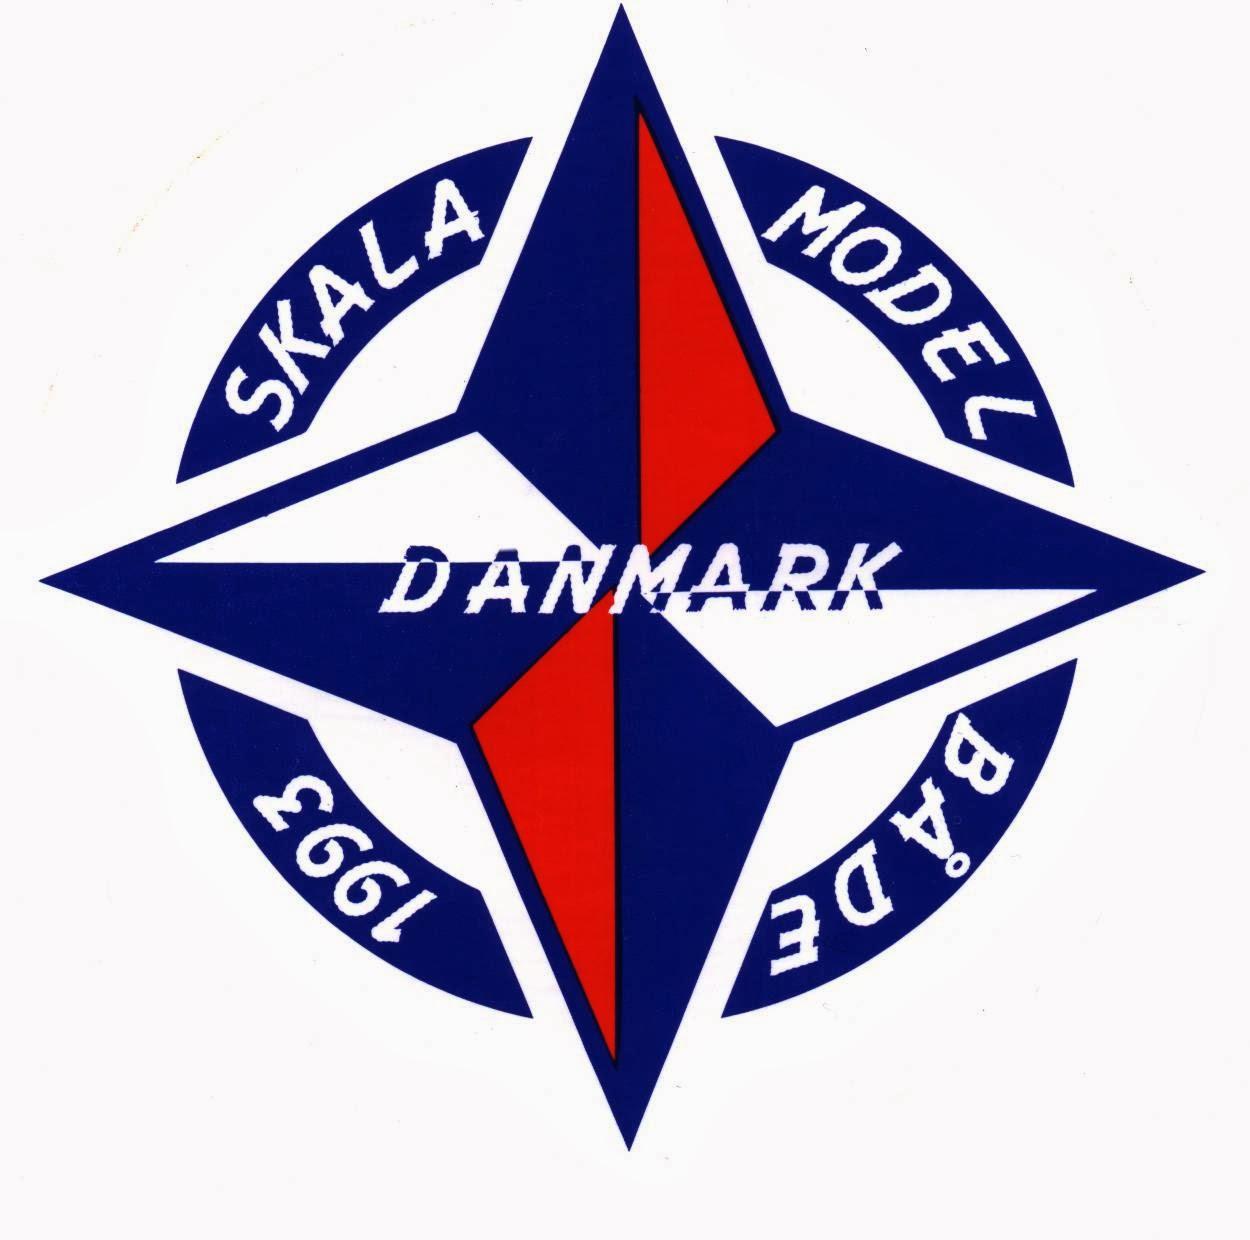 Skalamodelbåde Danmark